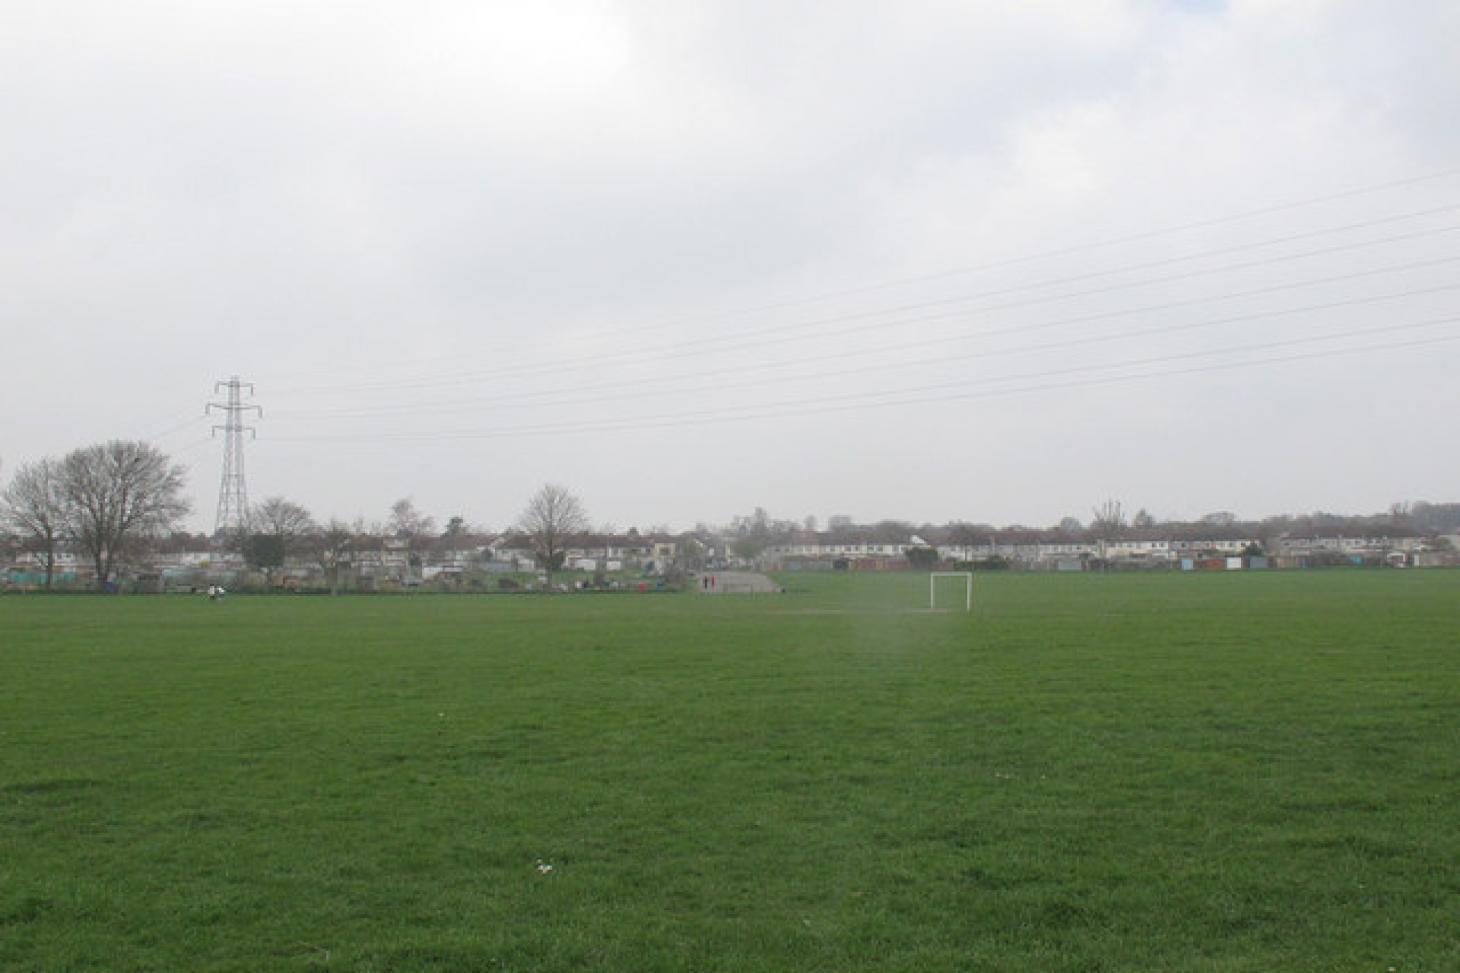 Penhill Park 11 a side | Grass football pitch